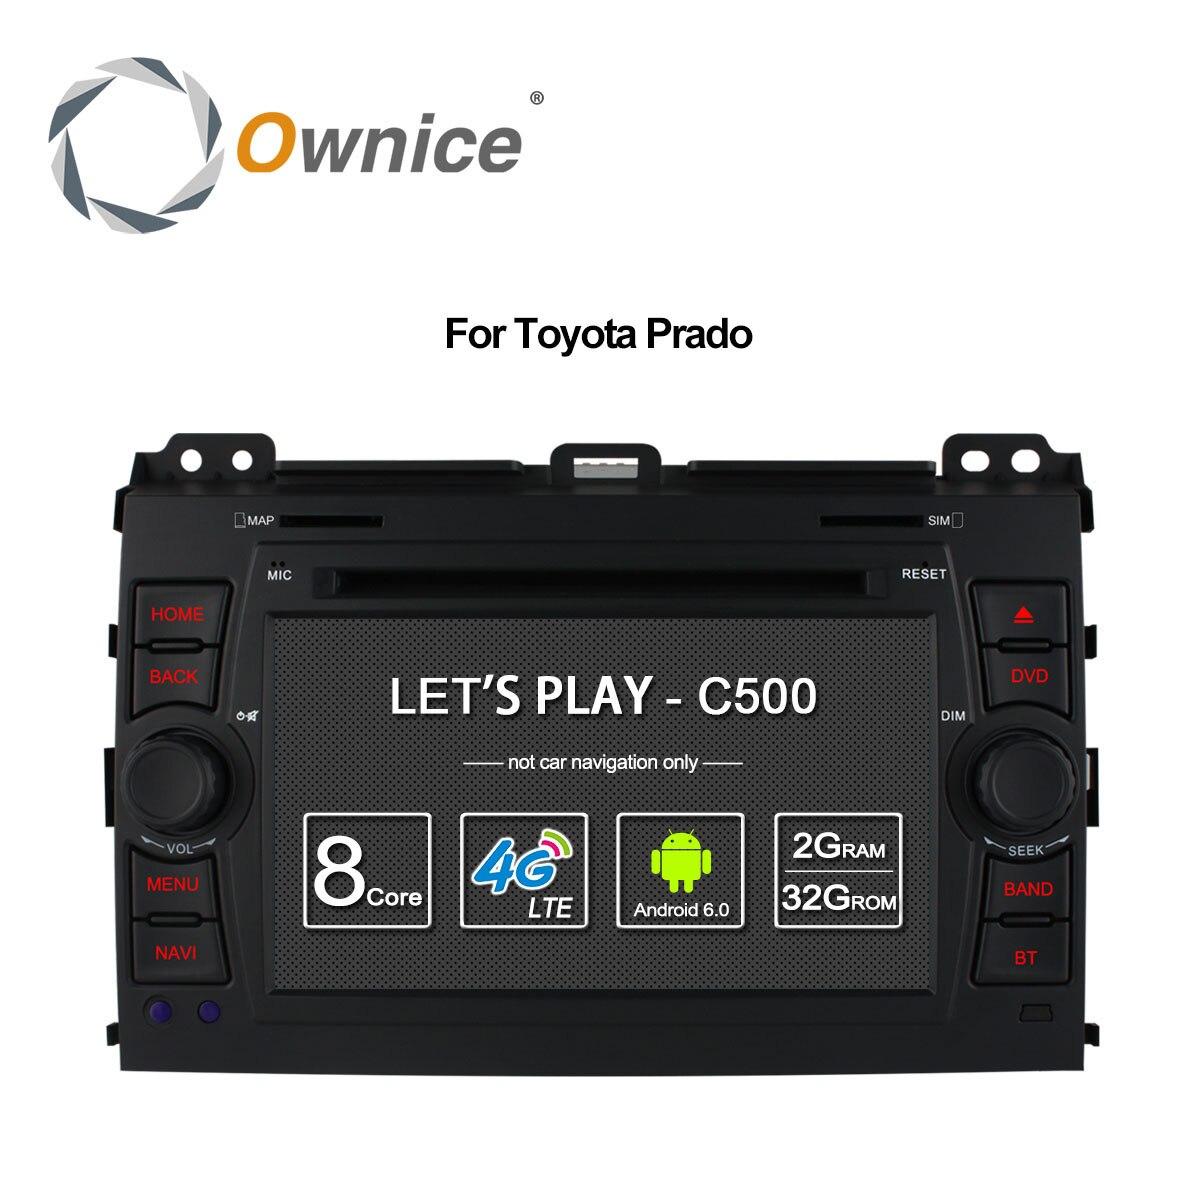 Ownice C500 4G LTE SIM Octa 8 Core Android 6.0 DVD de Voiture lecteur pour Toyota Land Cruiser Prado 120 2002-2009 GPS Navi Radio 32G ROM